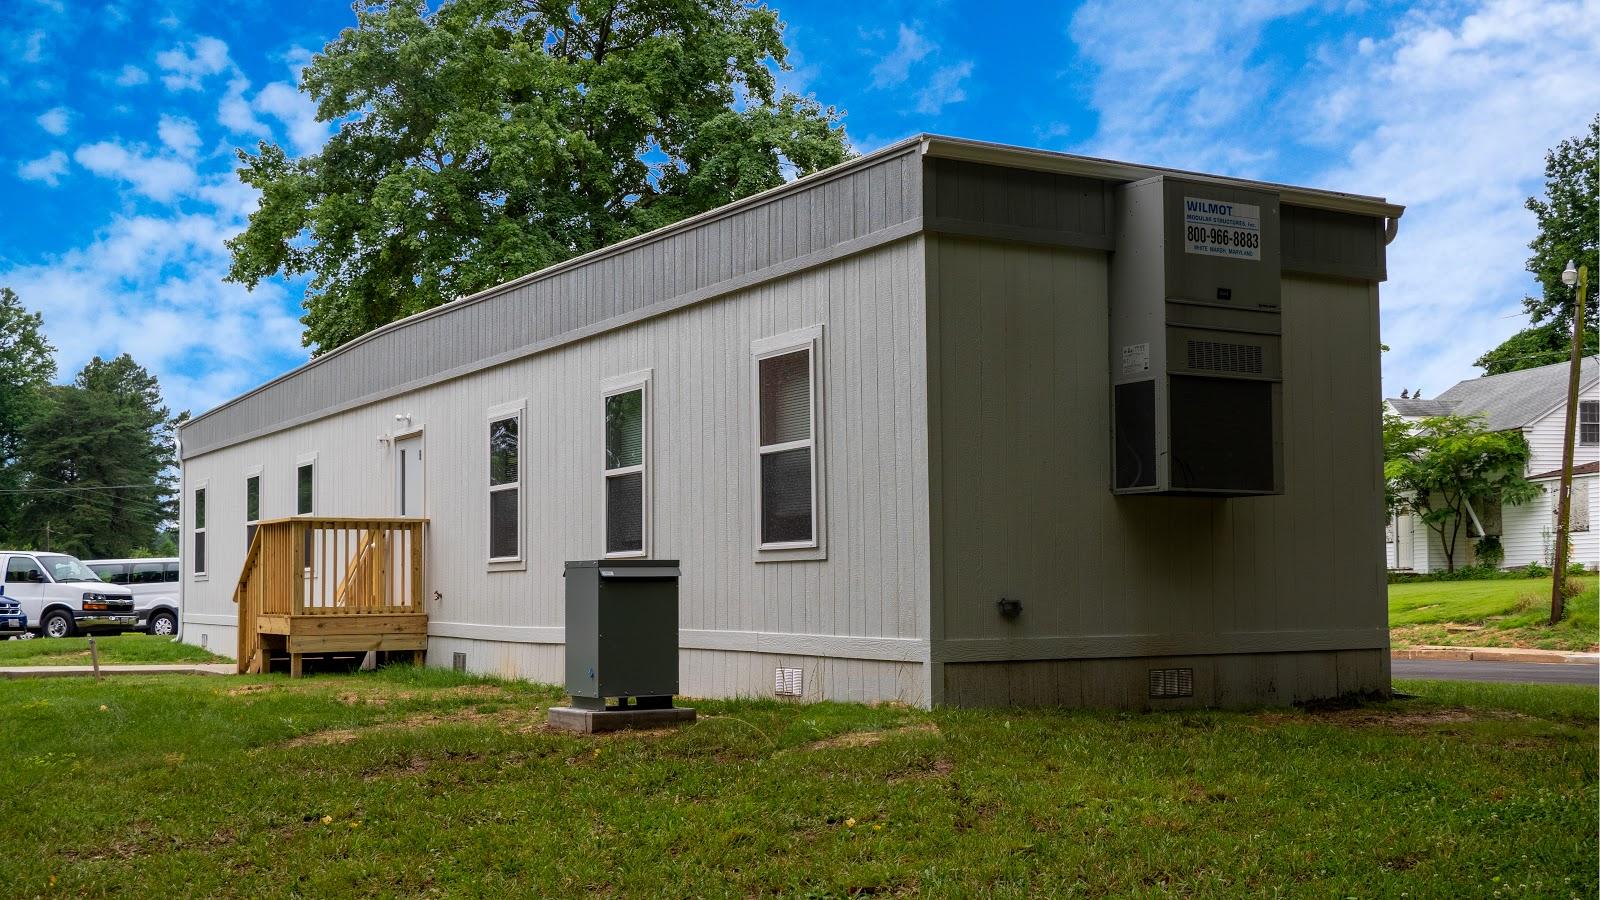 Exterior of a modular building outpatient treatment center